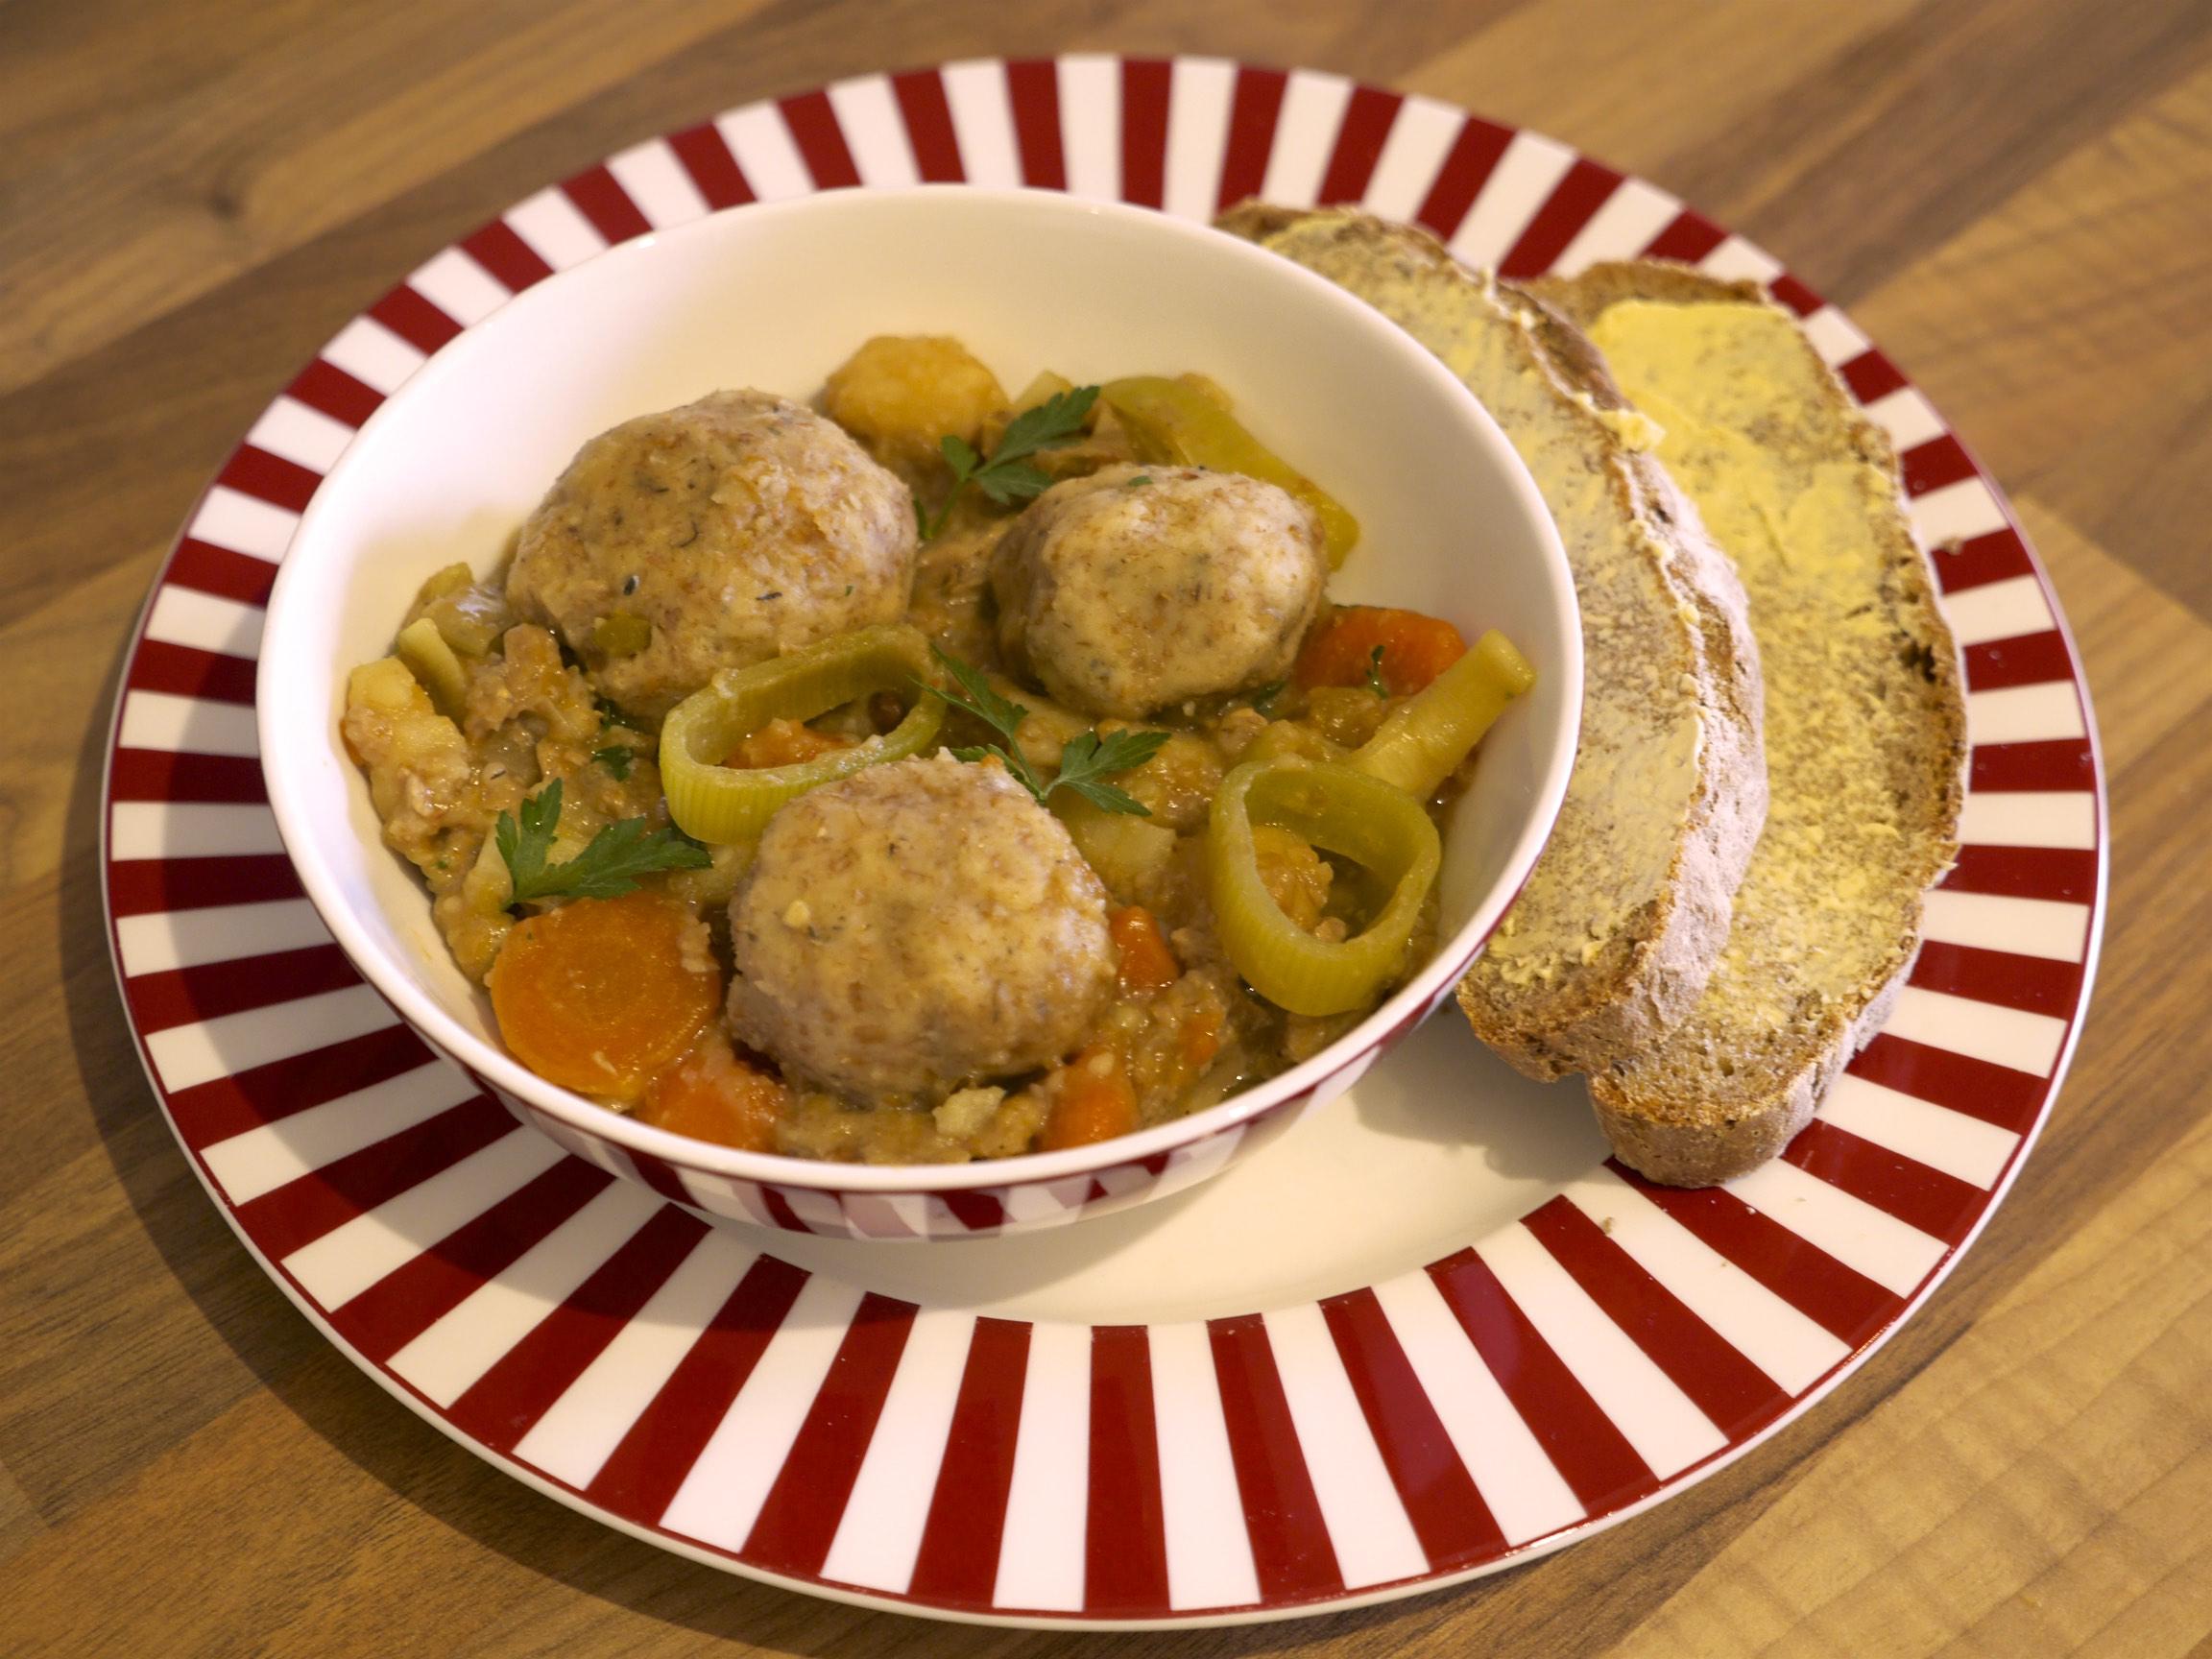 Cawl (Welsh stew) with herby dumplings